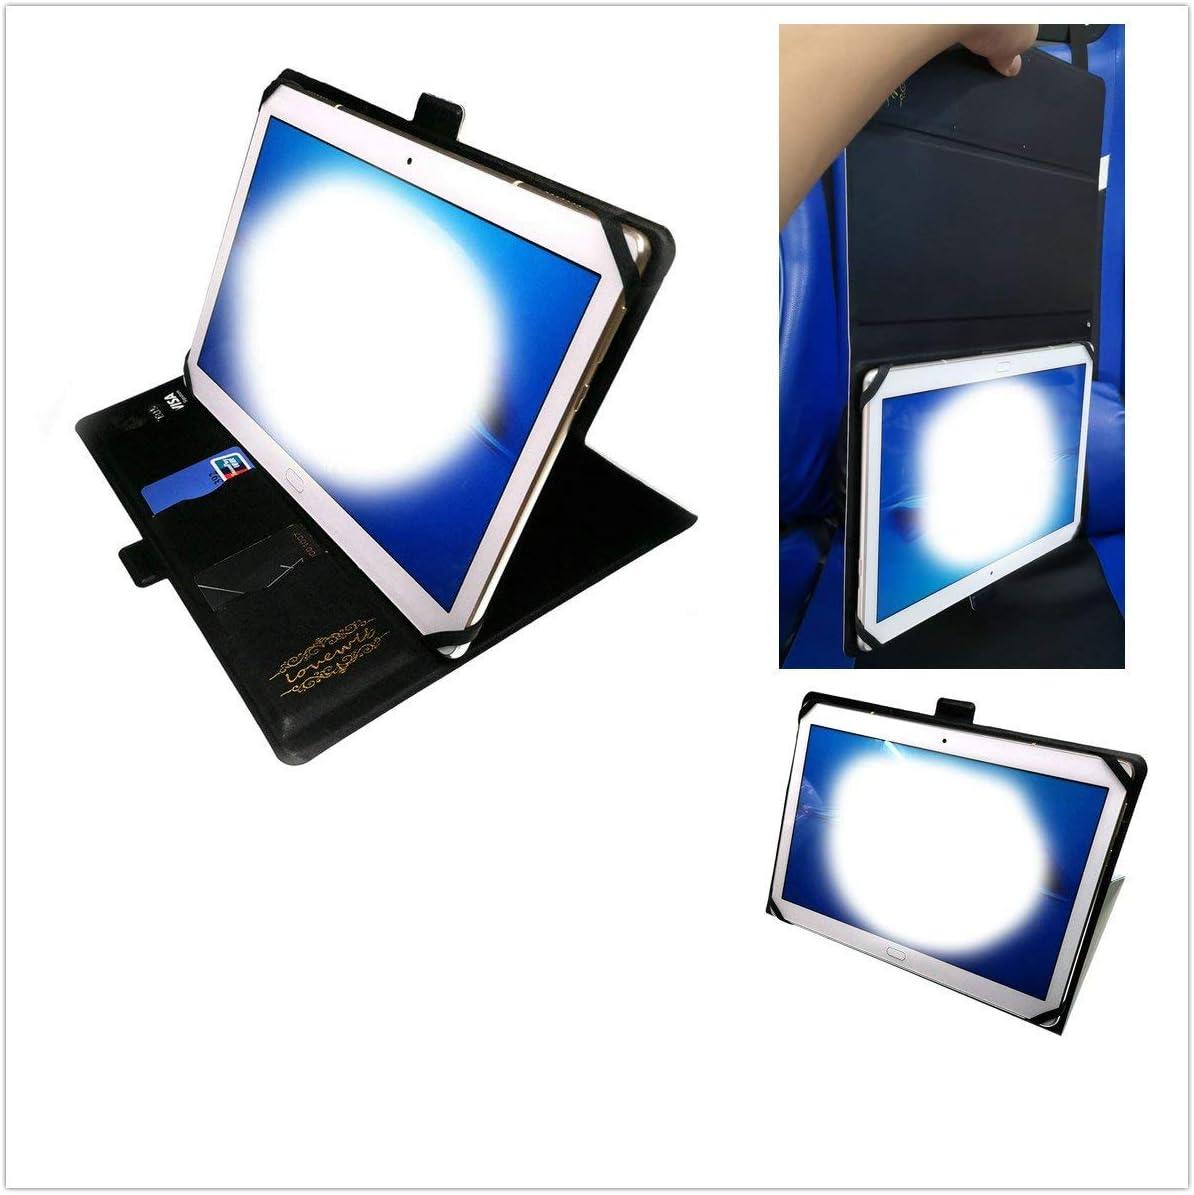 Lovewlb Tablet Funda para Leotec Supernova I216 Funda Soporte Cuero Case Cover Lang